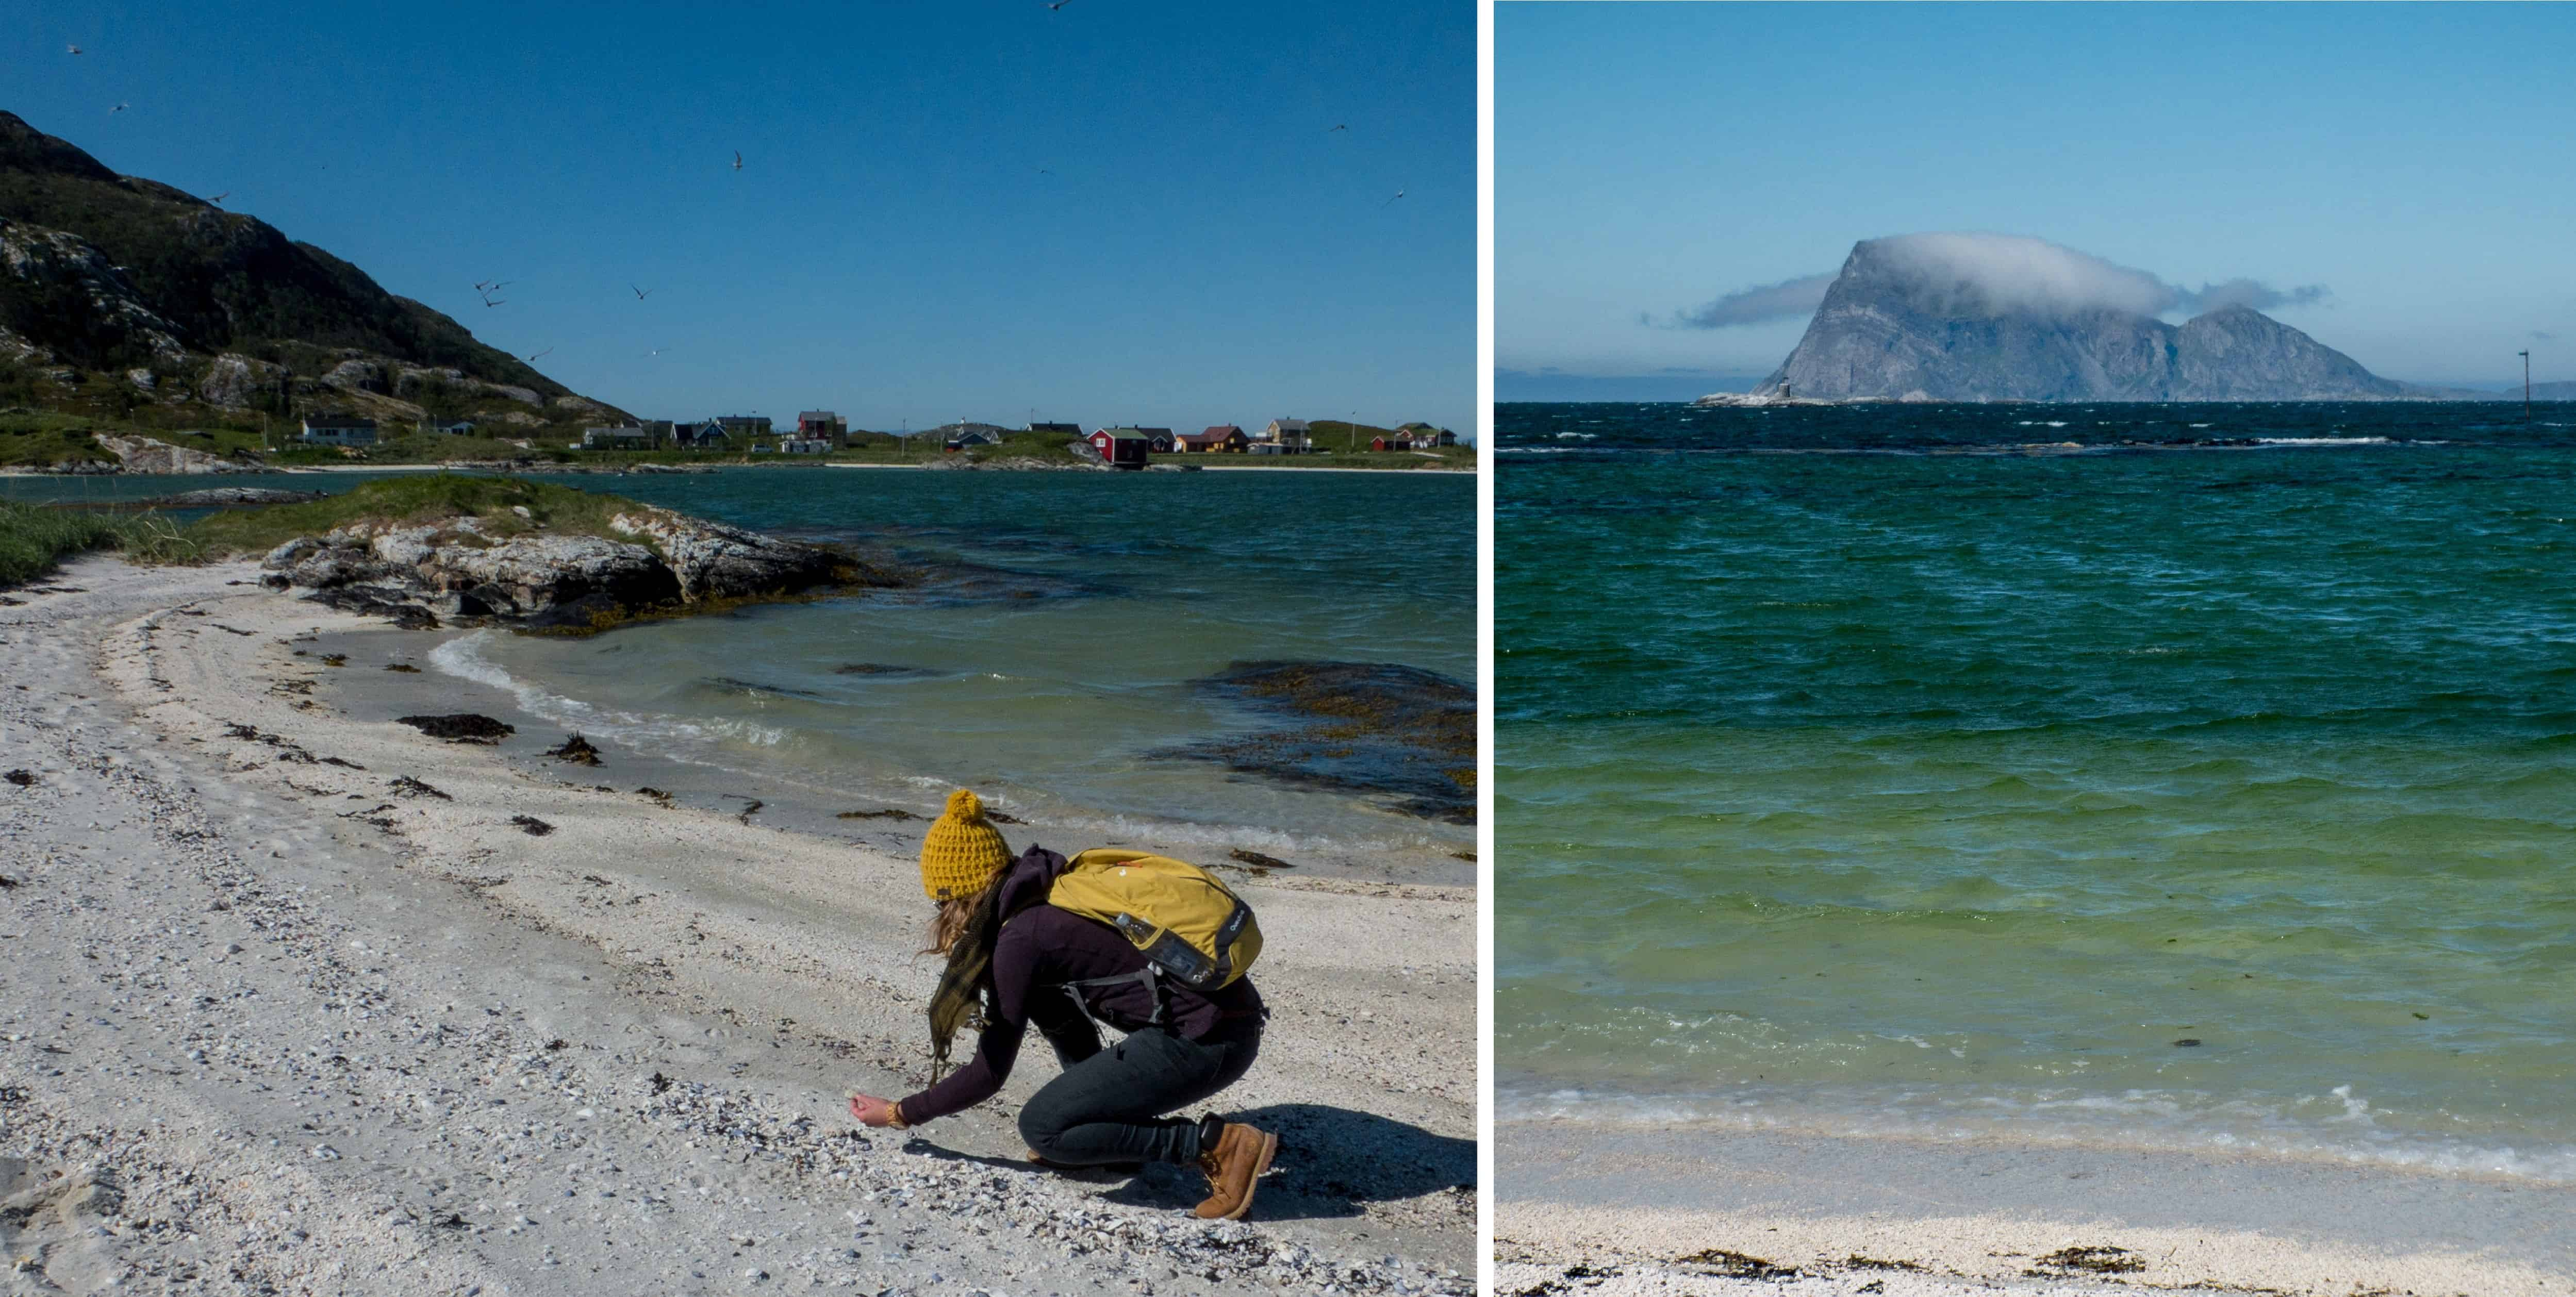 De eilandengroep Sommerøya, bekend om de spierwitte stranden